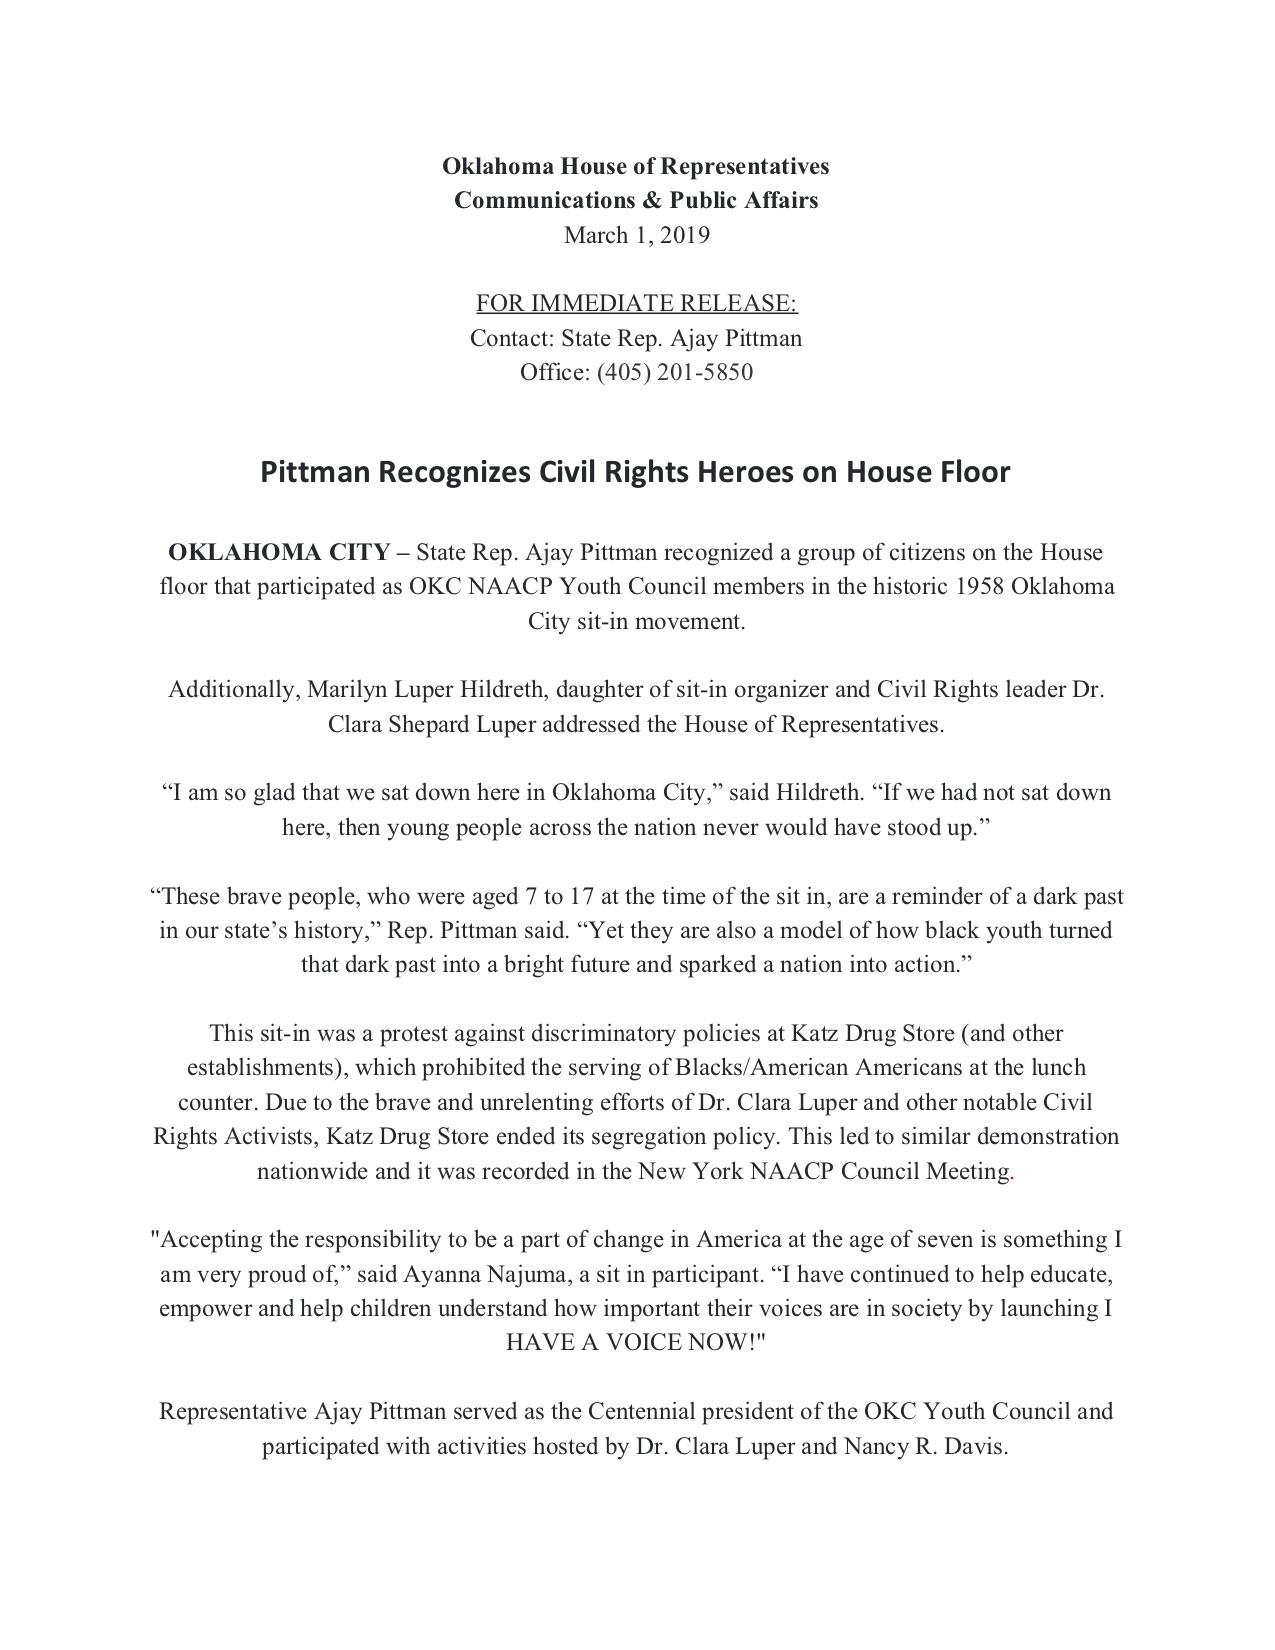 Pittman-Recognizes-CivilRightsHeroes.jpg